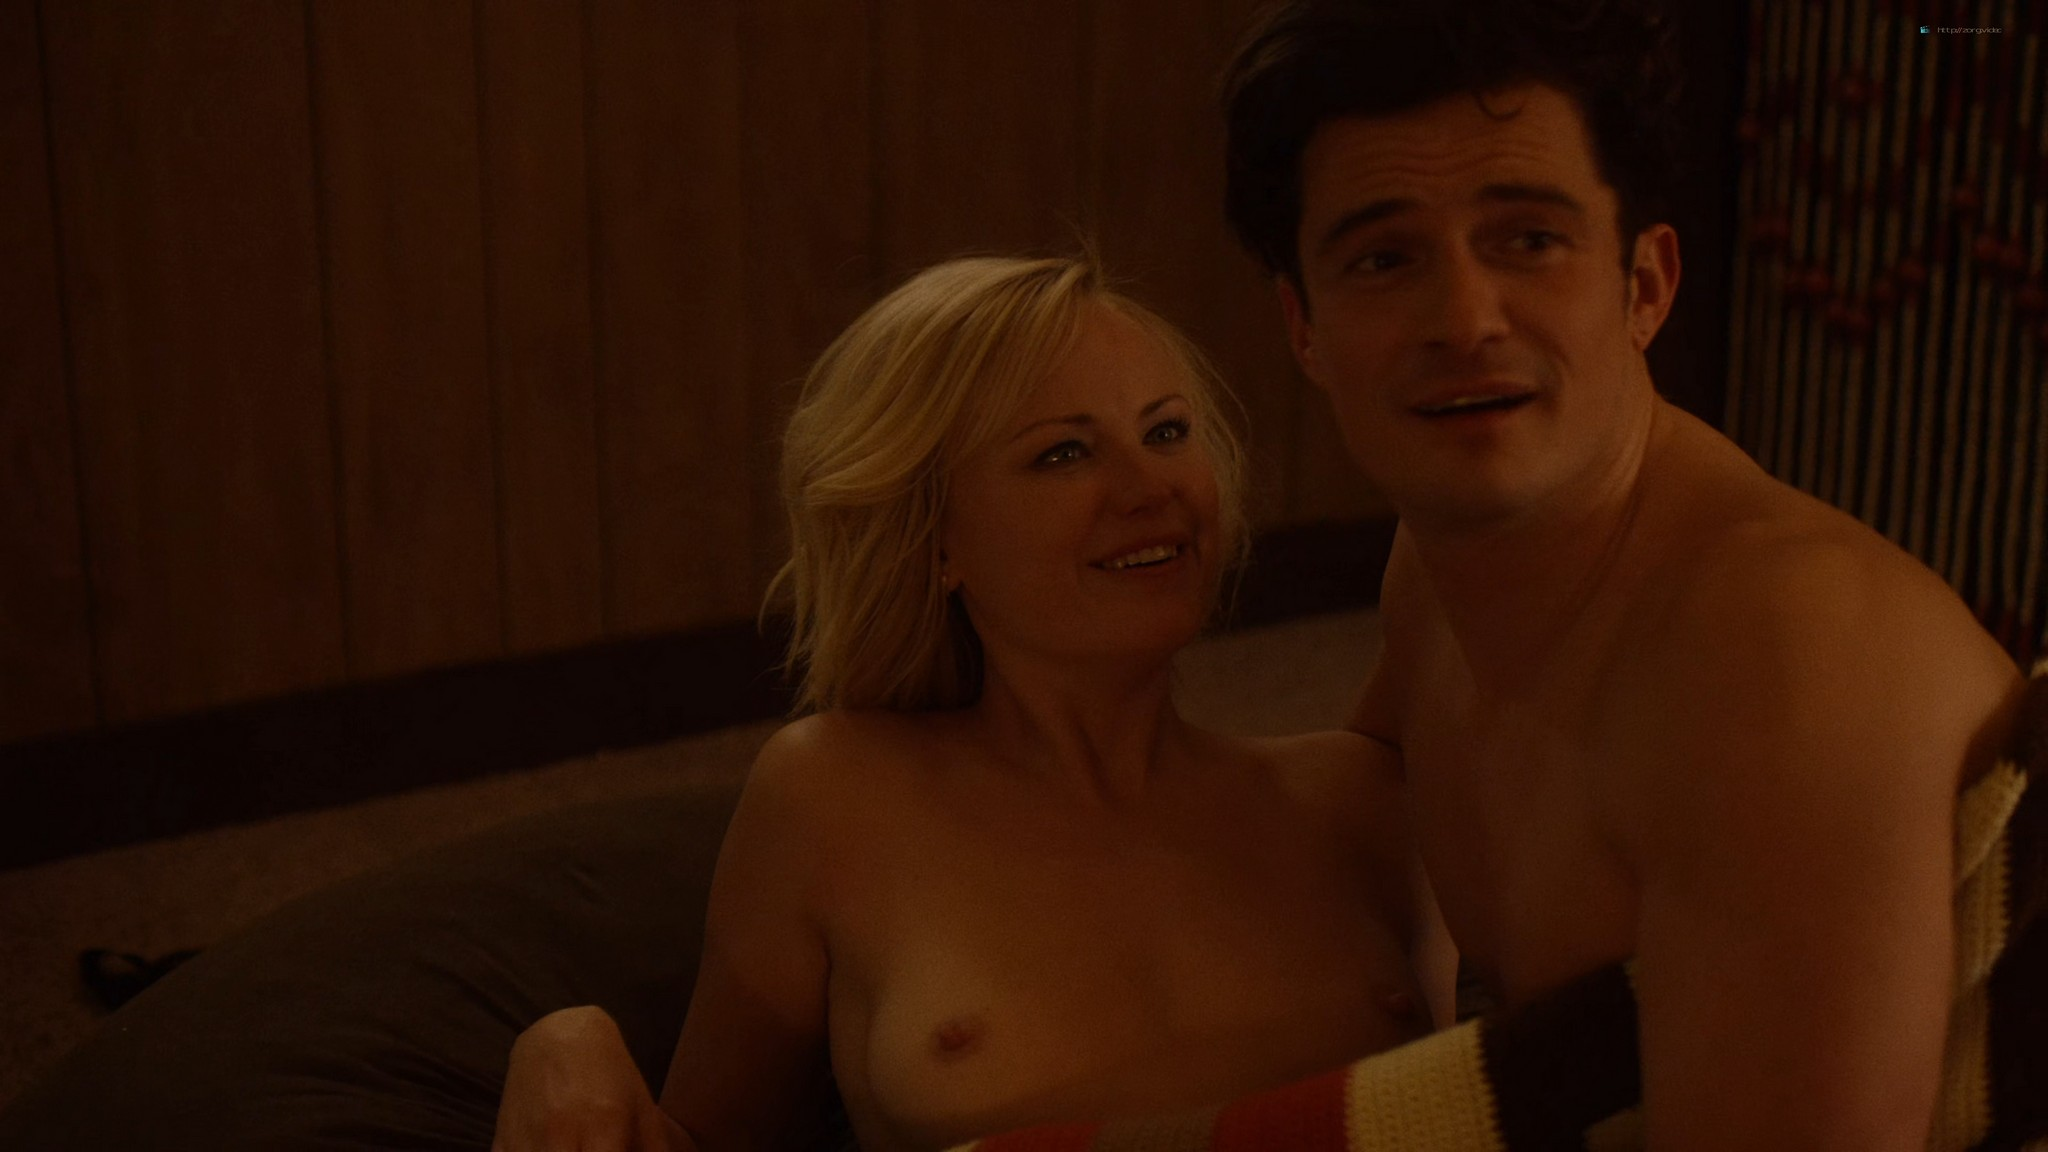 Malin Akerman nude sex threesome with Kate Micucci Easy 2016 s1e6 UHD 2160 1080p 018